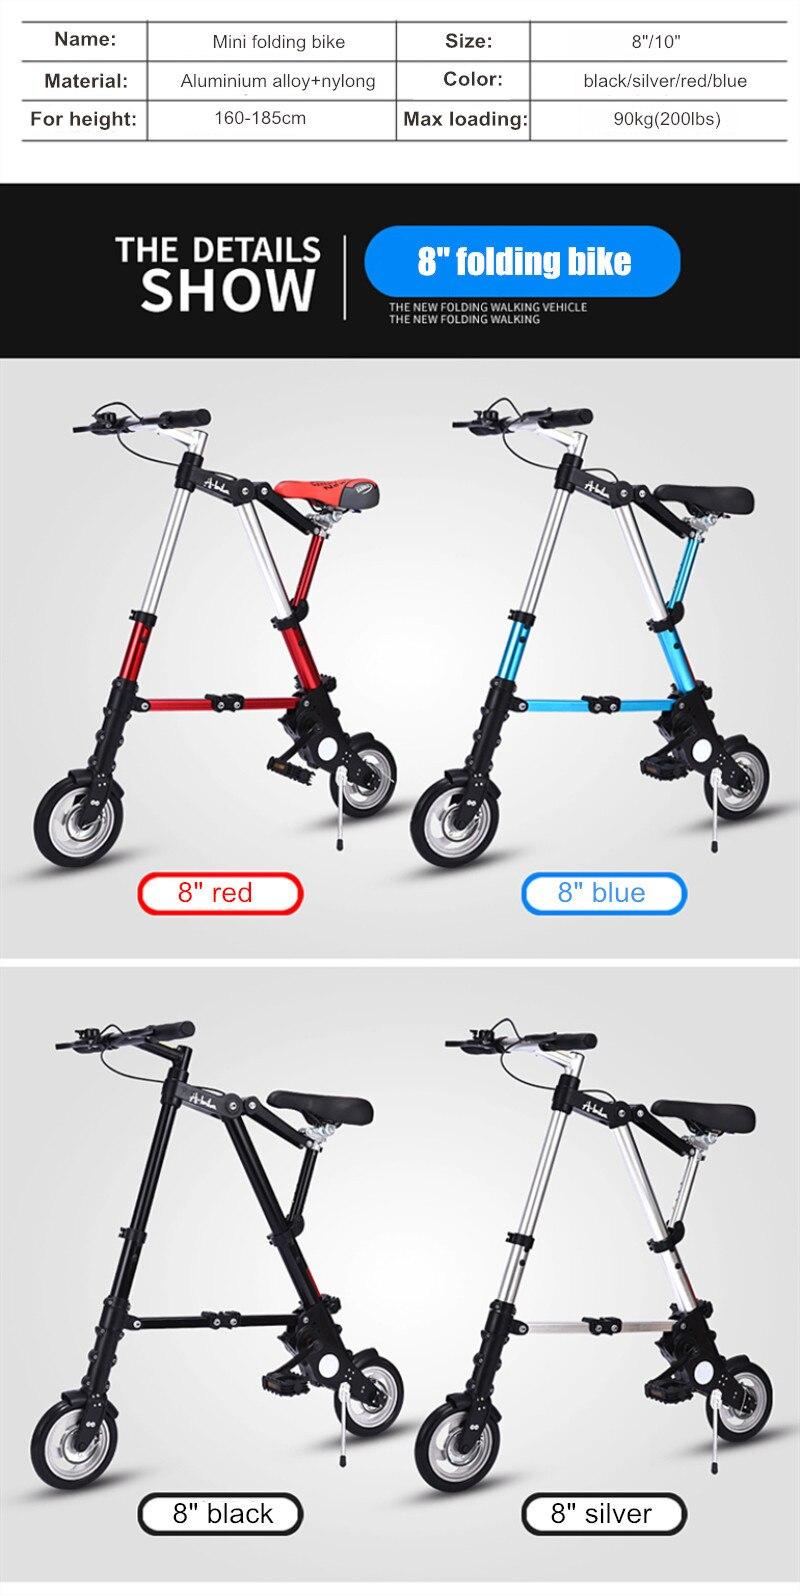 "HTB17wqdXbr1gK0jSZR0q6zP8XXaq Brand New Ultra Light 8""/10"" Mini Folding Bike Bicycle Portable Outdoor Subway Transit Vehicles Foldable Bicicleta"